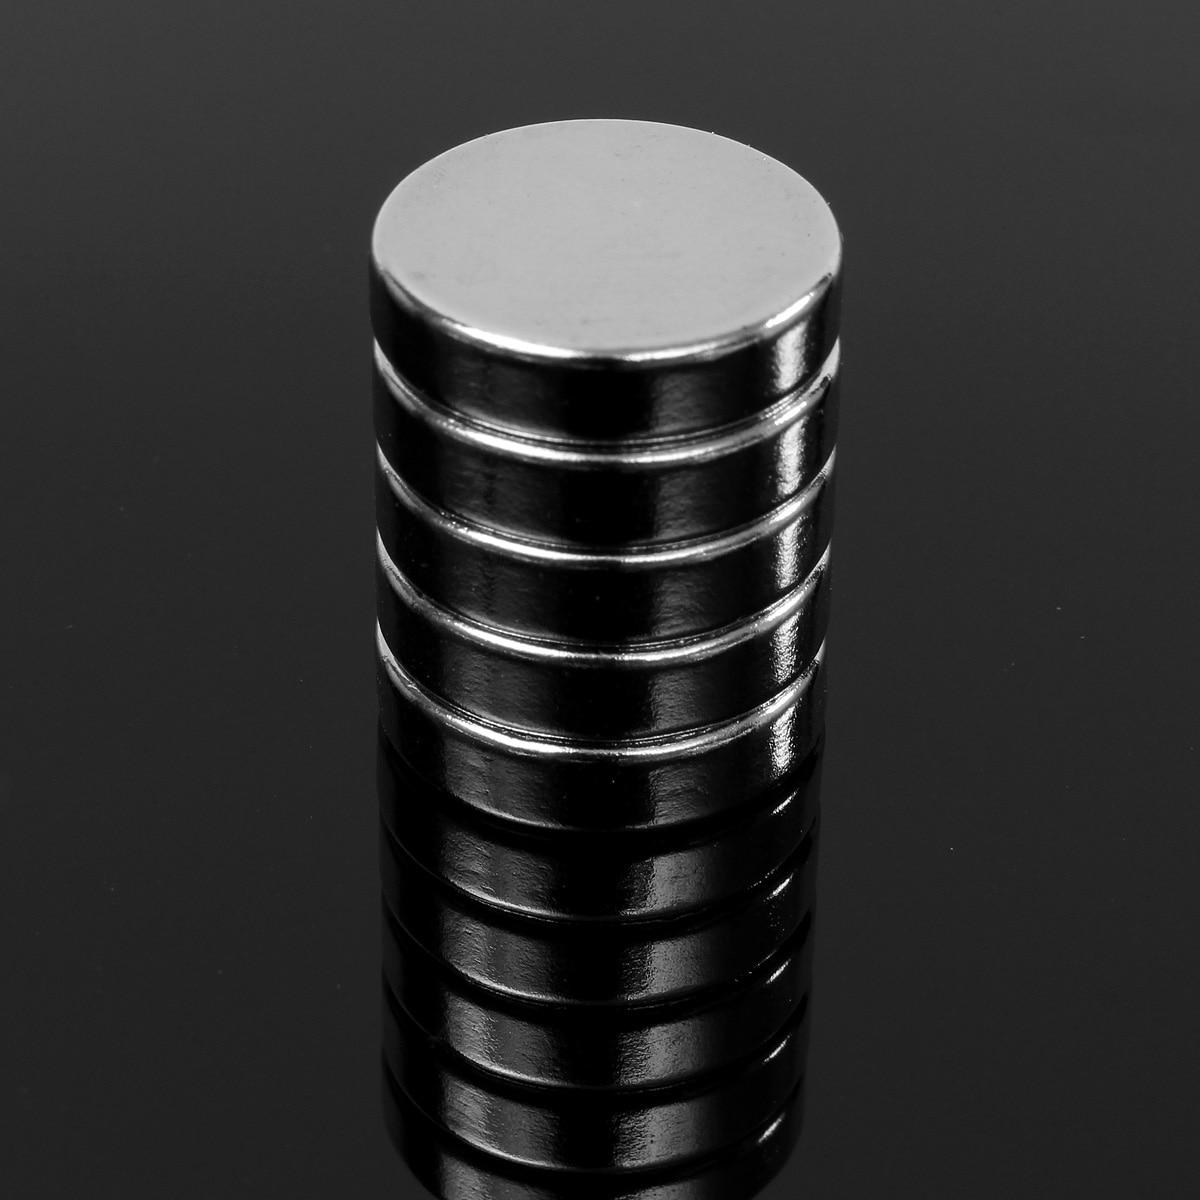 10pcs 20mm x 2mm Disc Rare Earth Neodymium Super strong Magnets N50 Craft Model